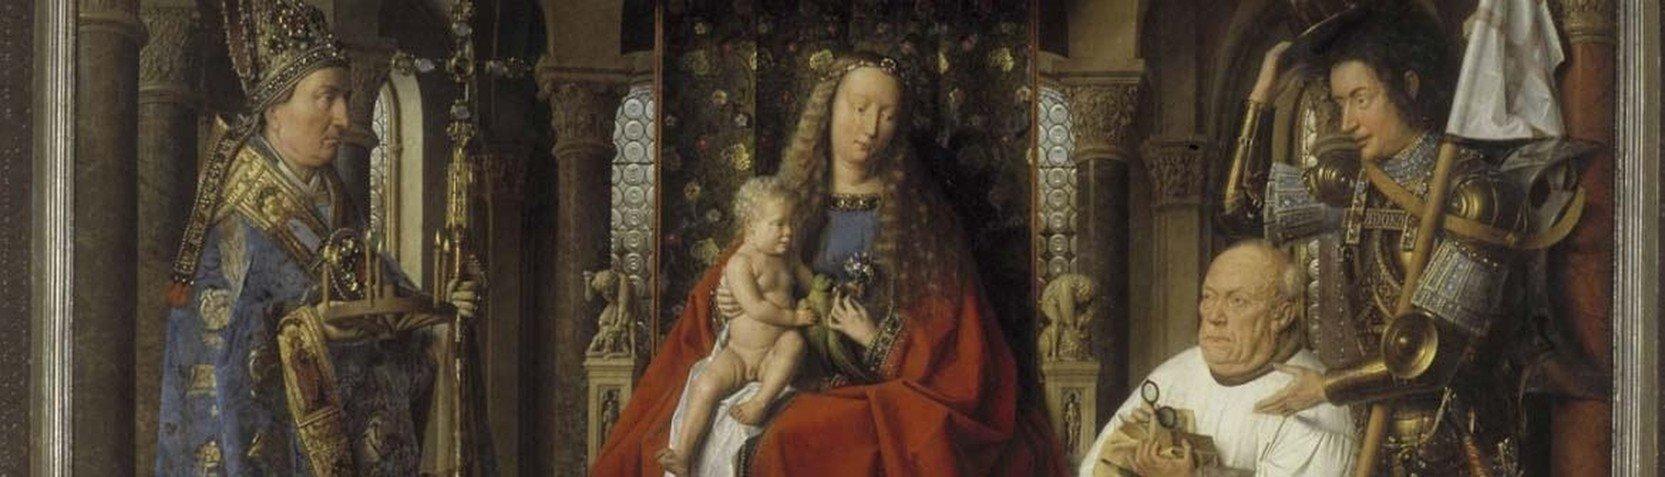 Artisti - Jan van Eyck